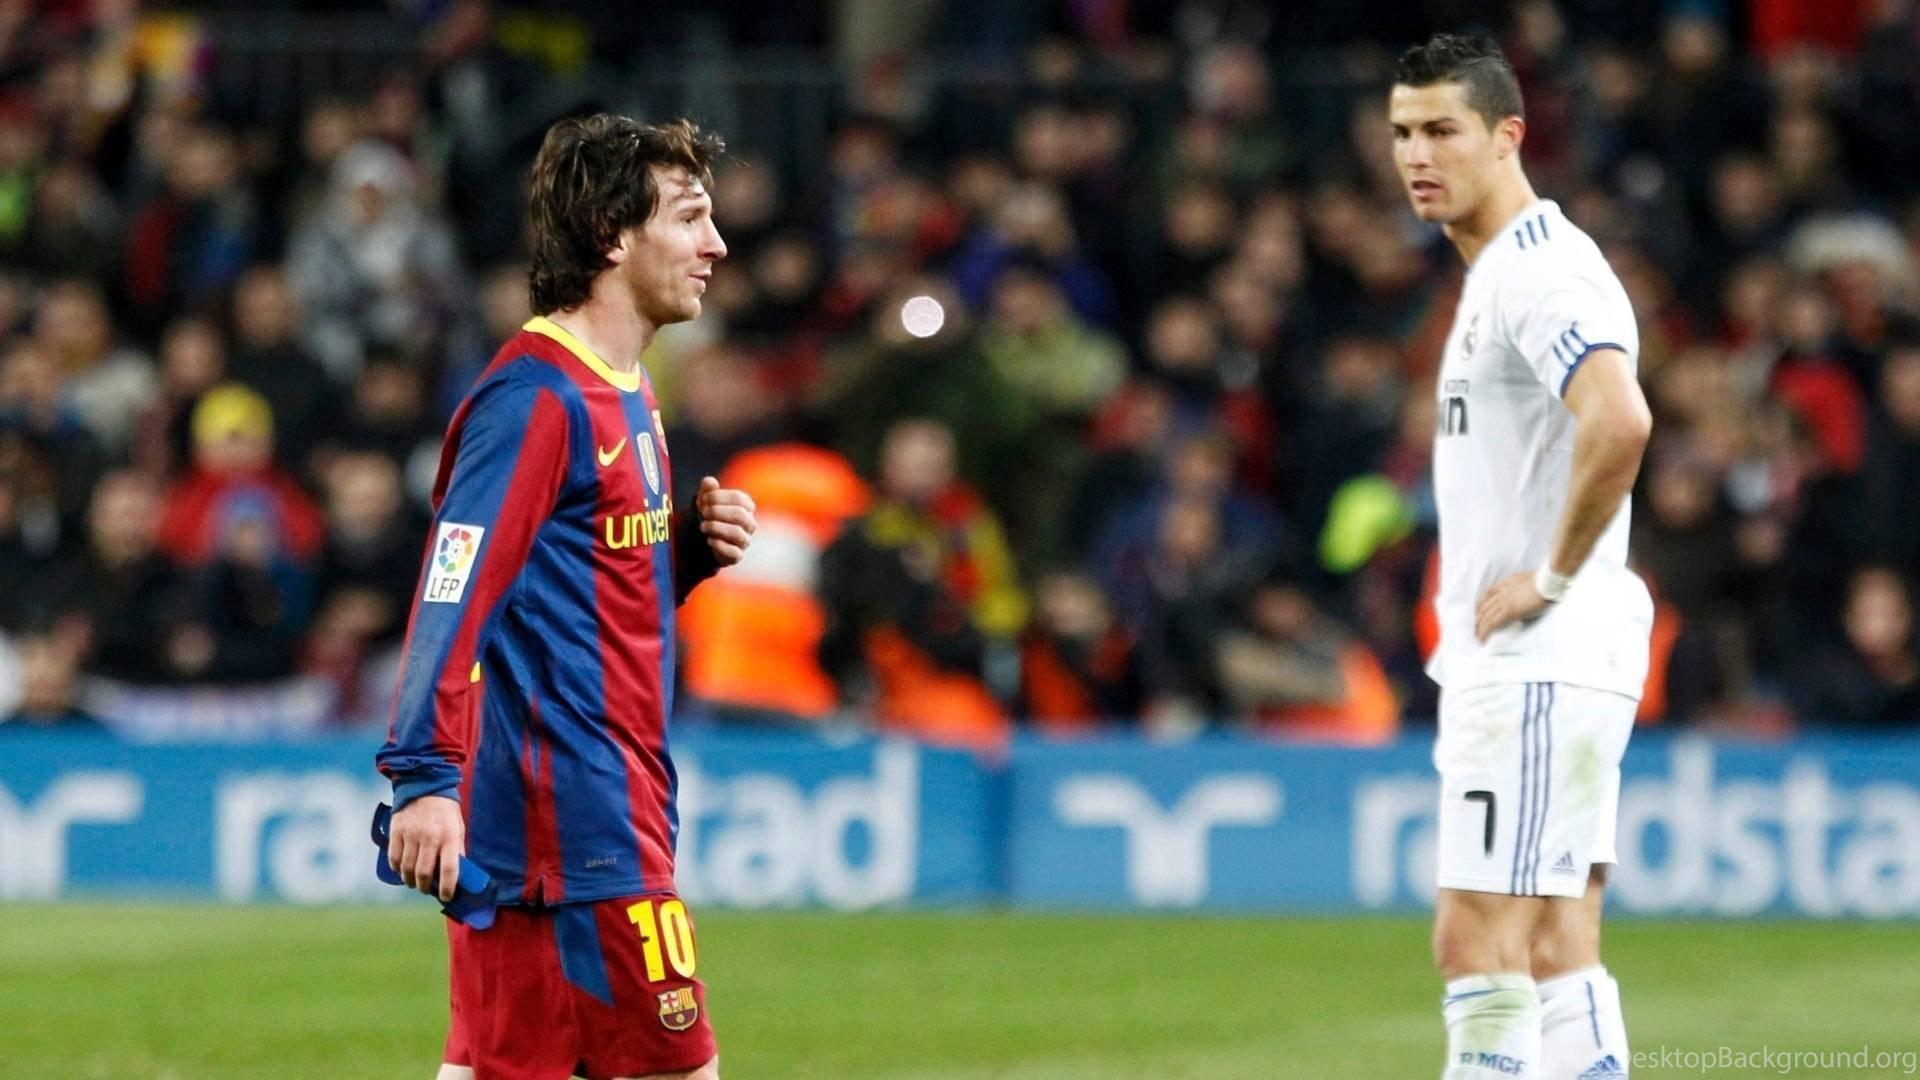 Messi Vs Ronaldo Footballers Wallpapers Football Hd Wallpapers